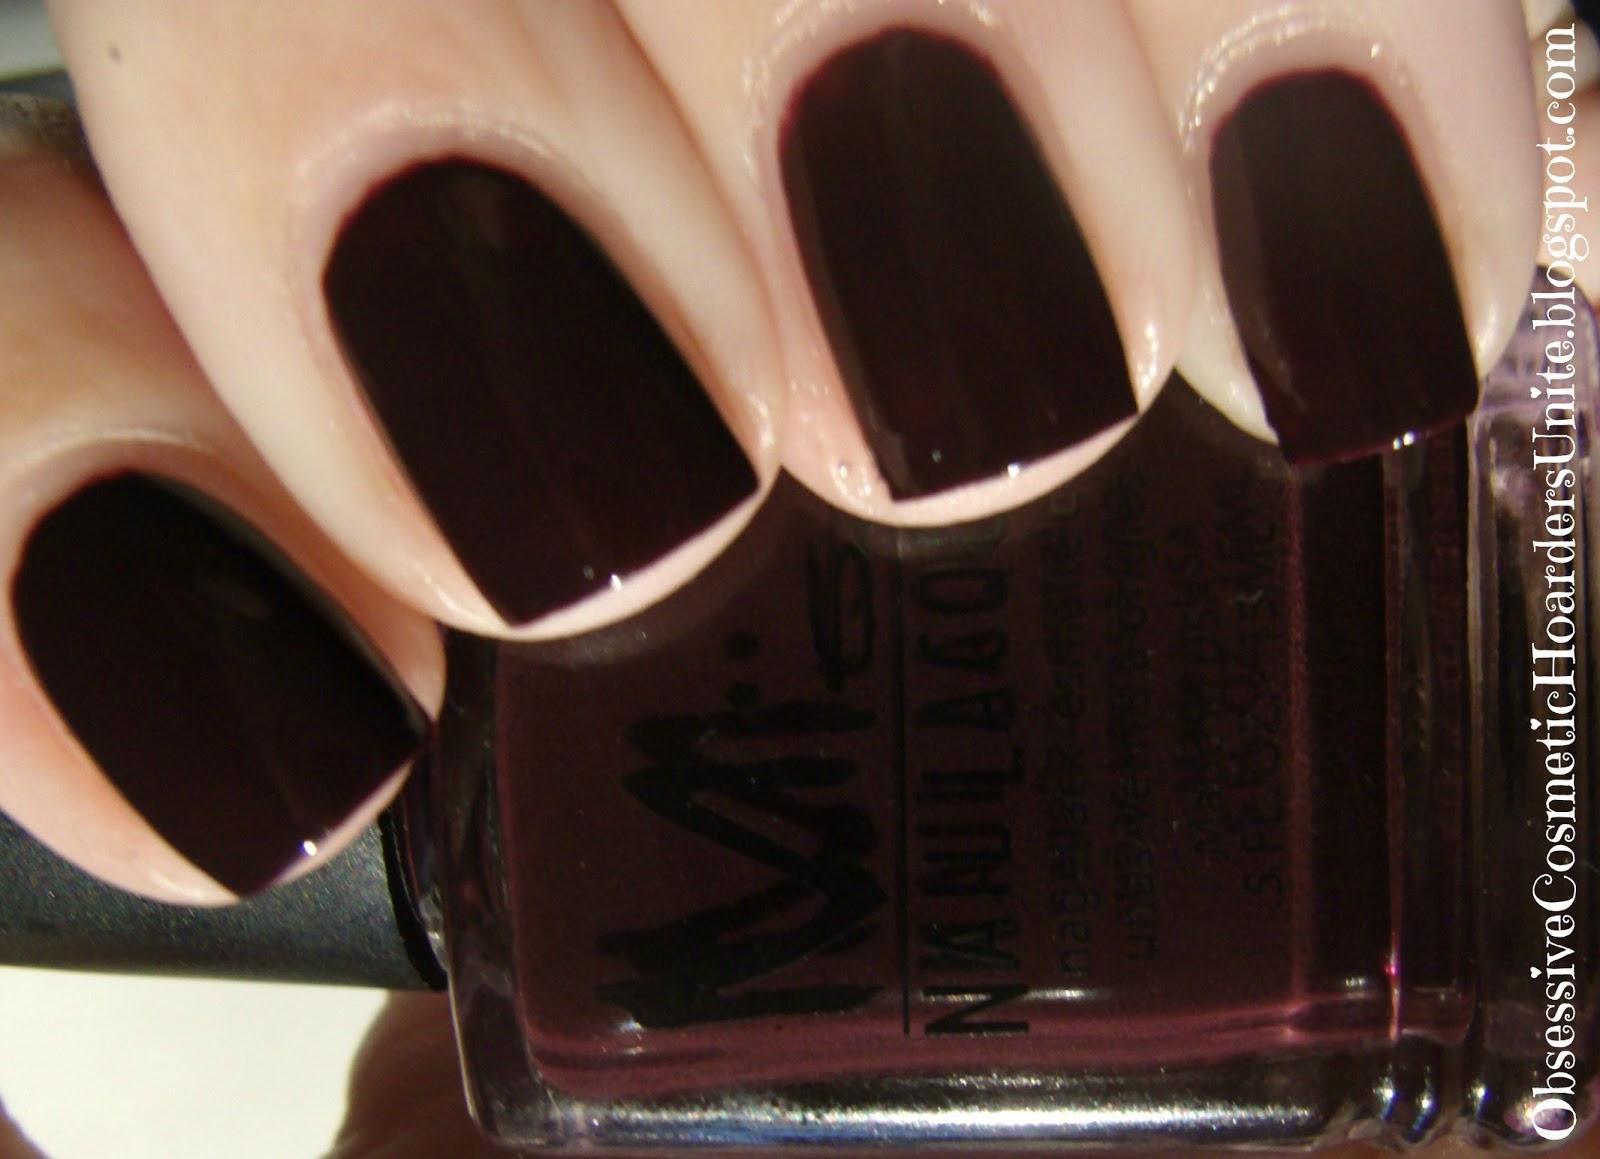 kozmetikbloglari: Misa High Society Collection Nail Polish Pictures ...